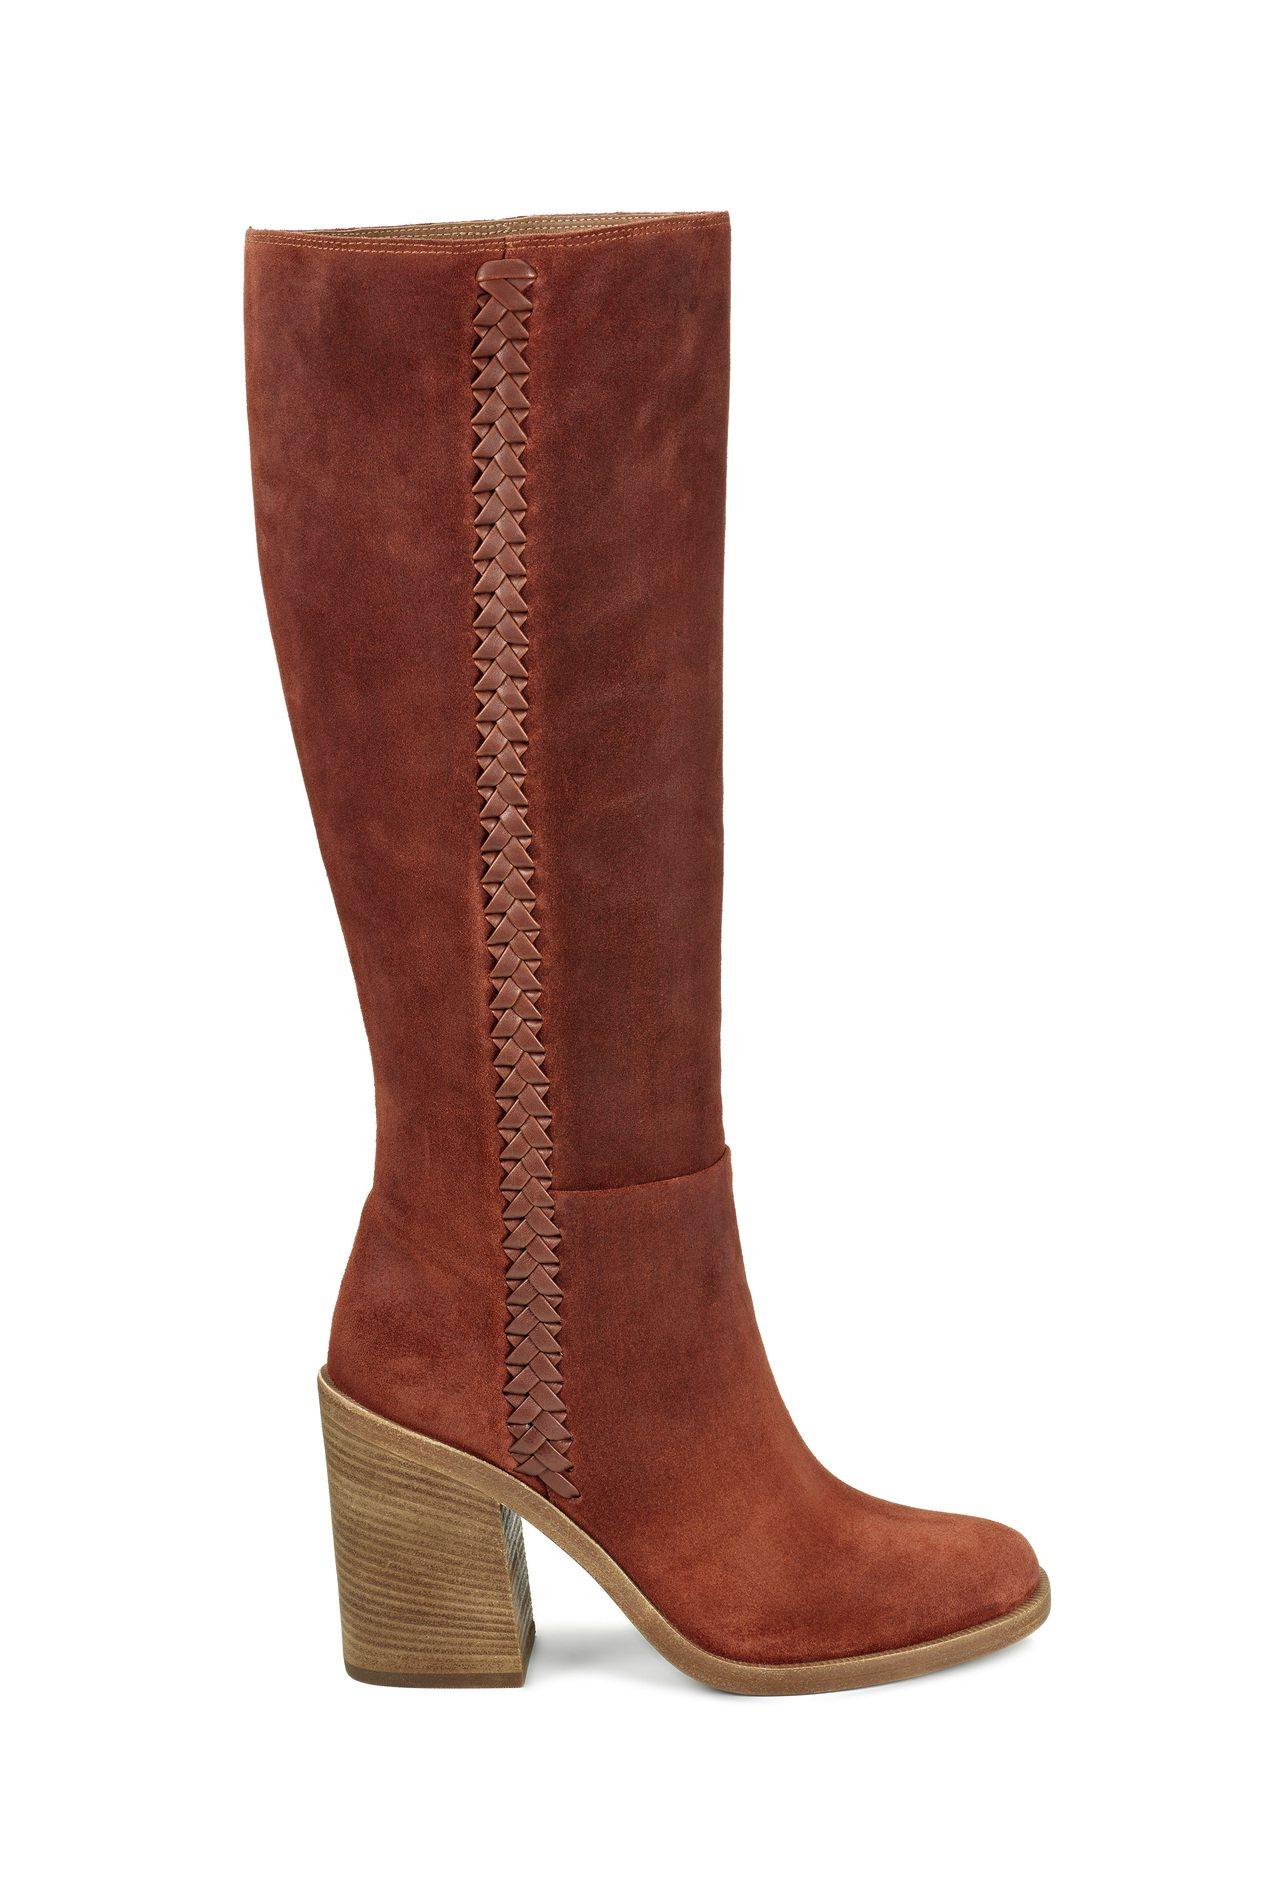 Maeva粗跟長靴,15,800元。圖/UGG提供